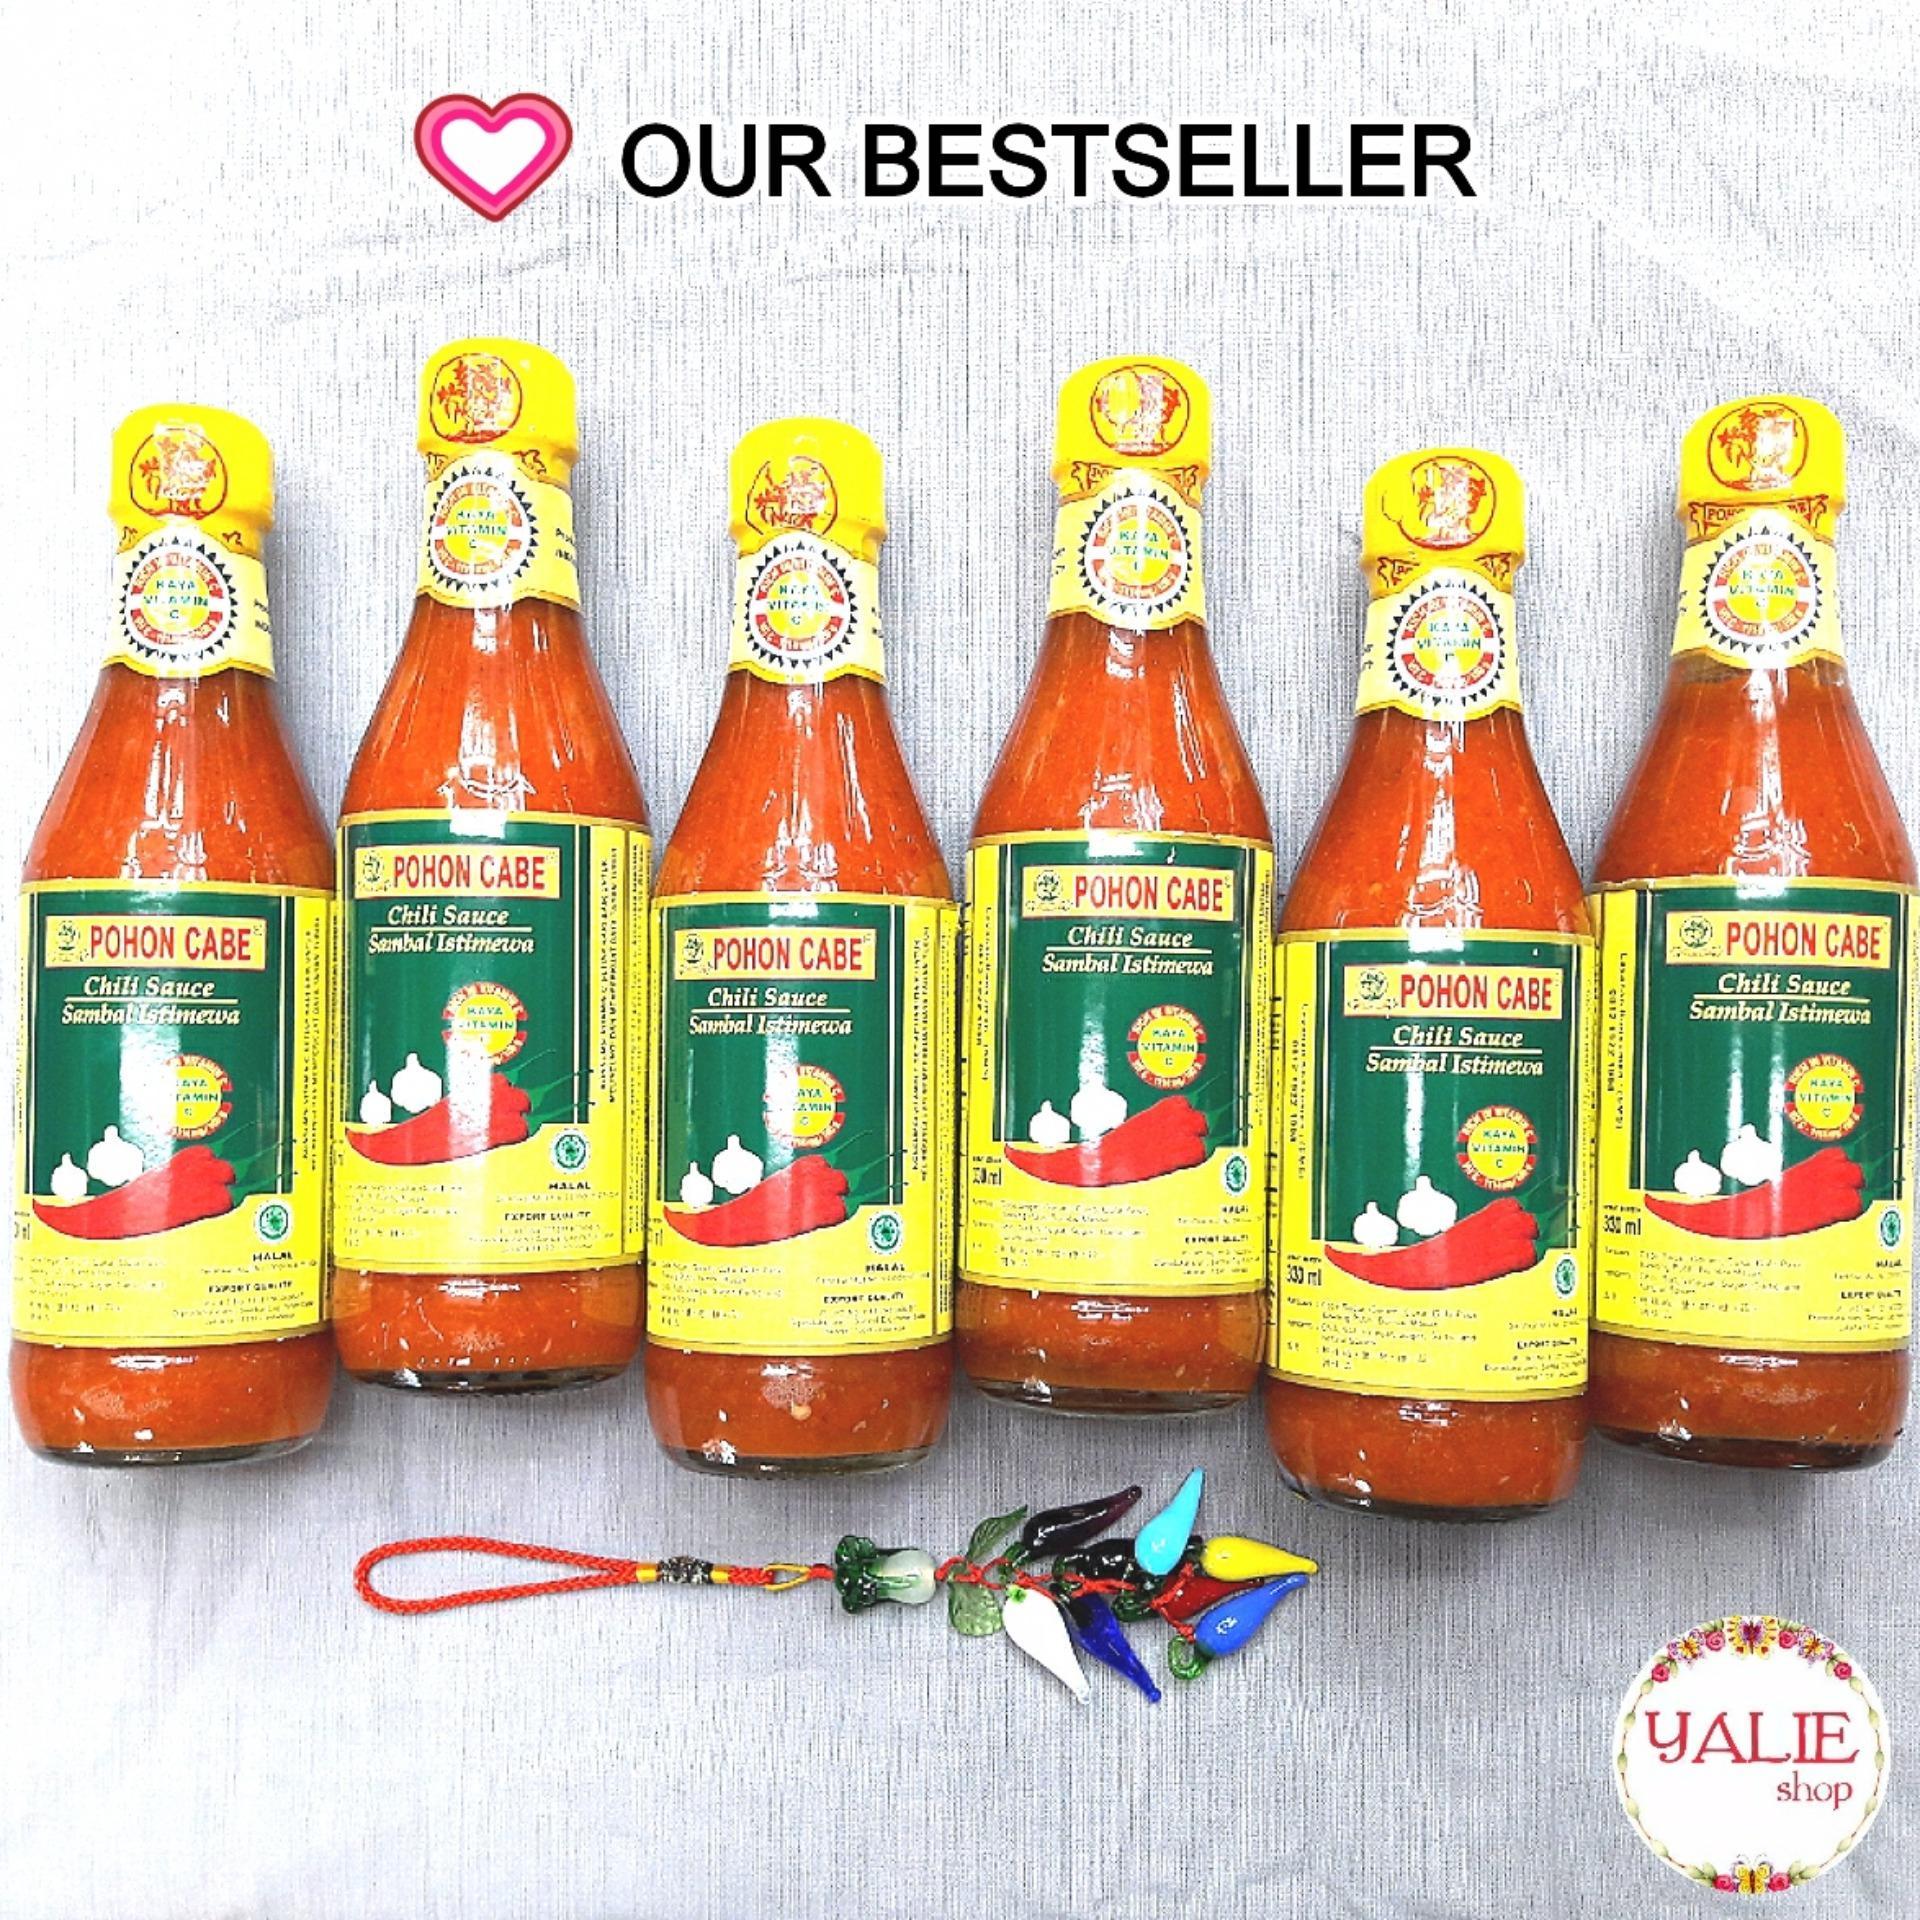 Mc Lewis Saus Cabe Ekstra Pedas Chilli Sauce Extra Hot 1 Kg Spec Saos Sambal Pohon 15669925 Source 330